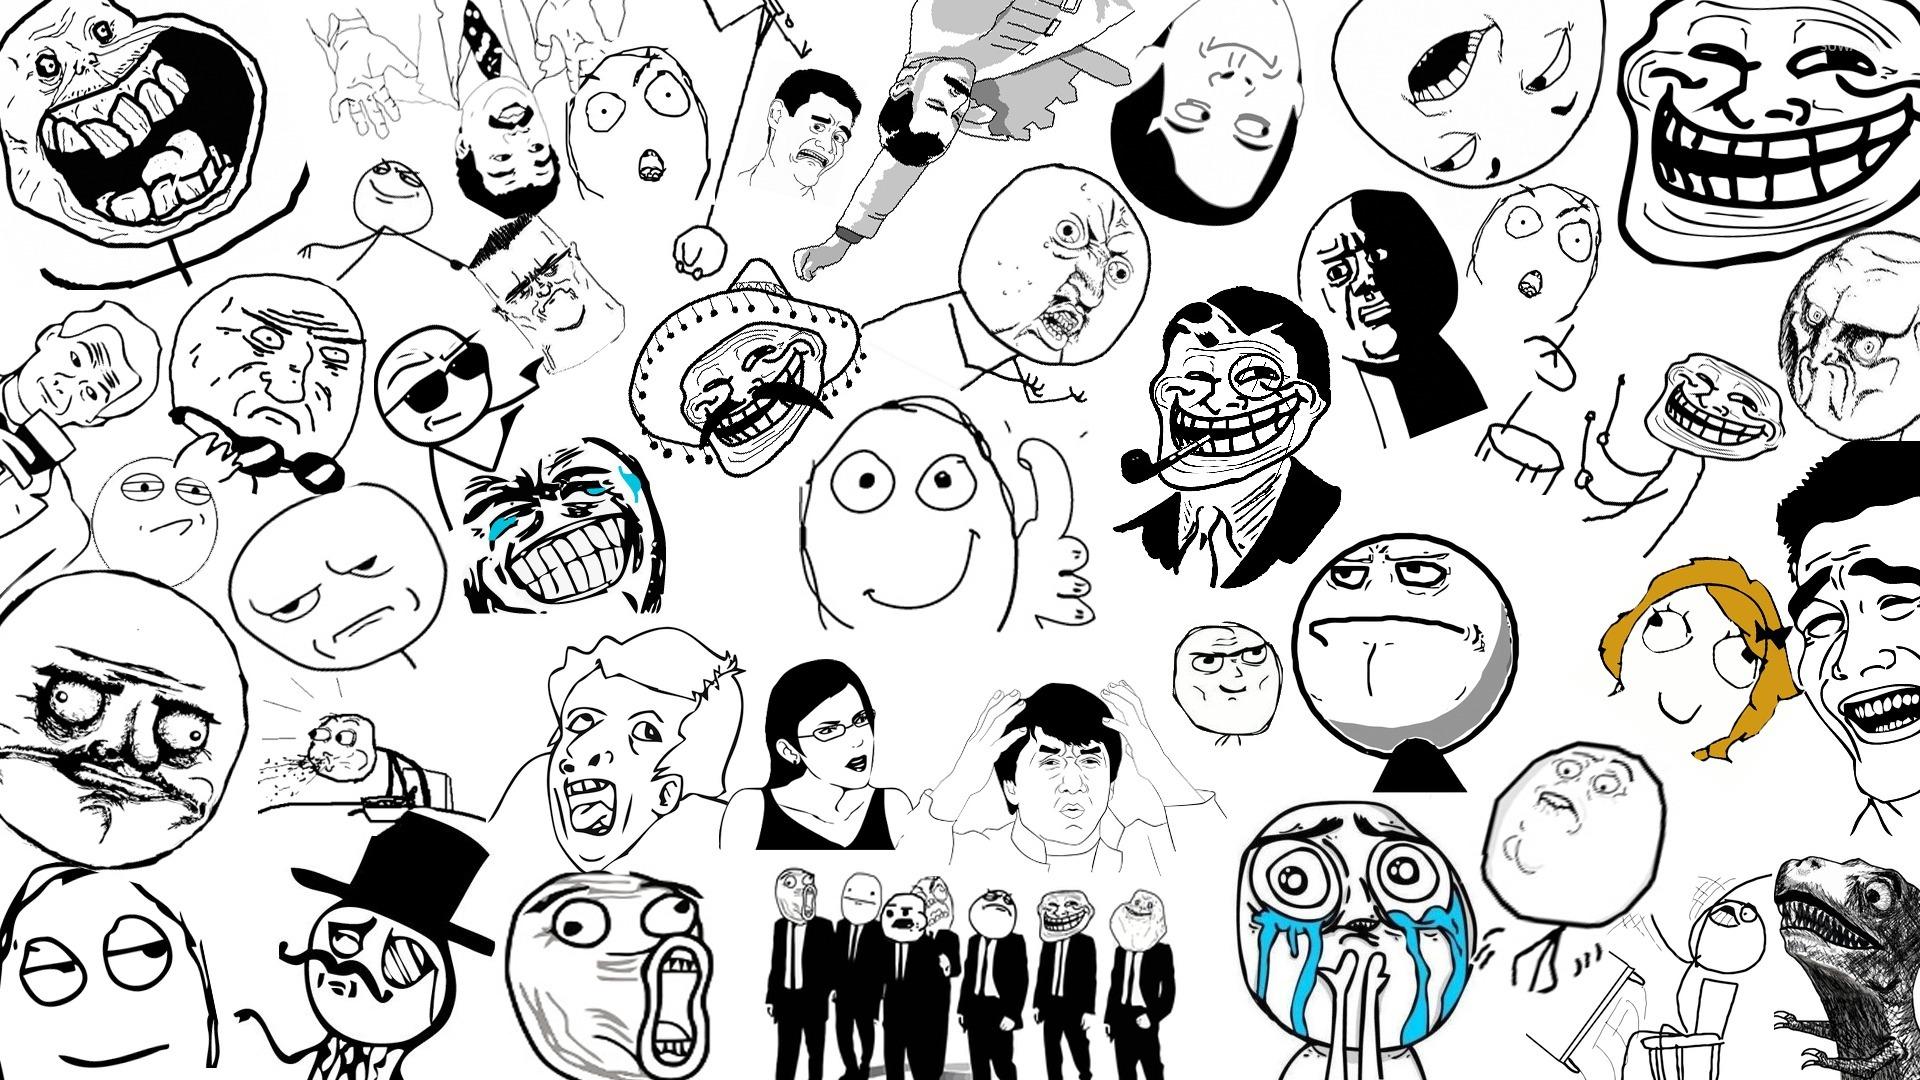 Meme compilation wallpaper   Meme wallpapers   21800 1920x1080